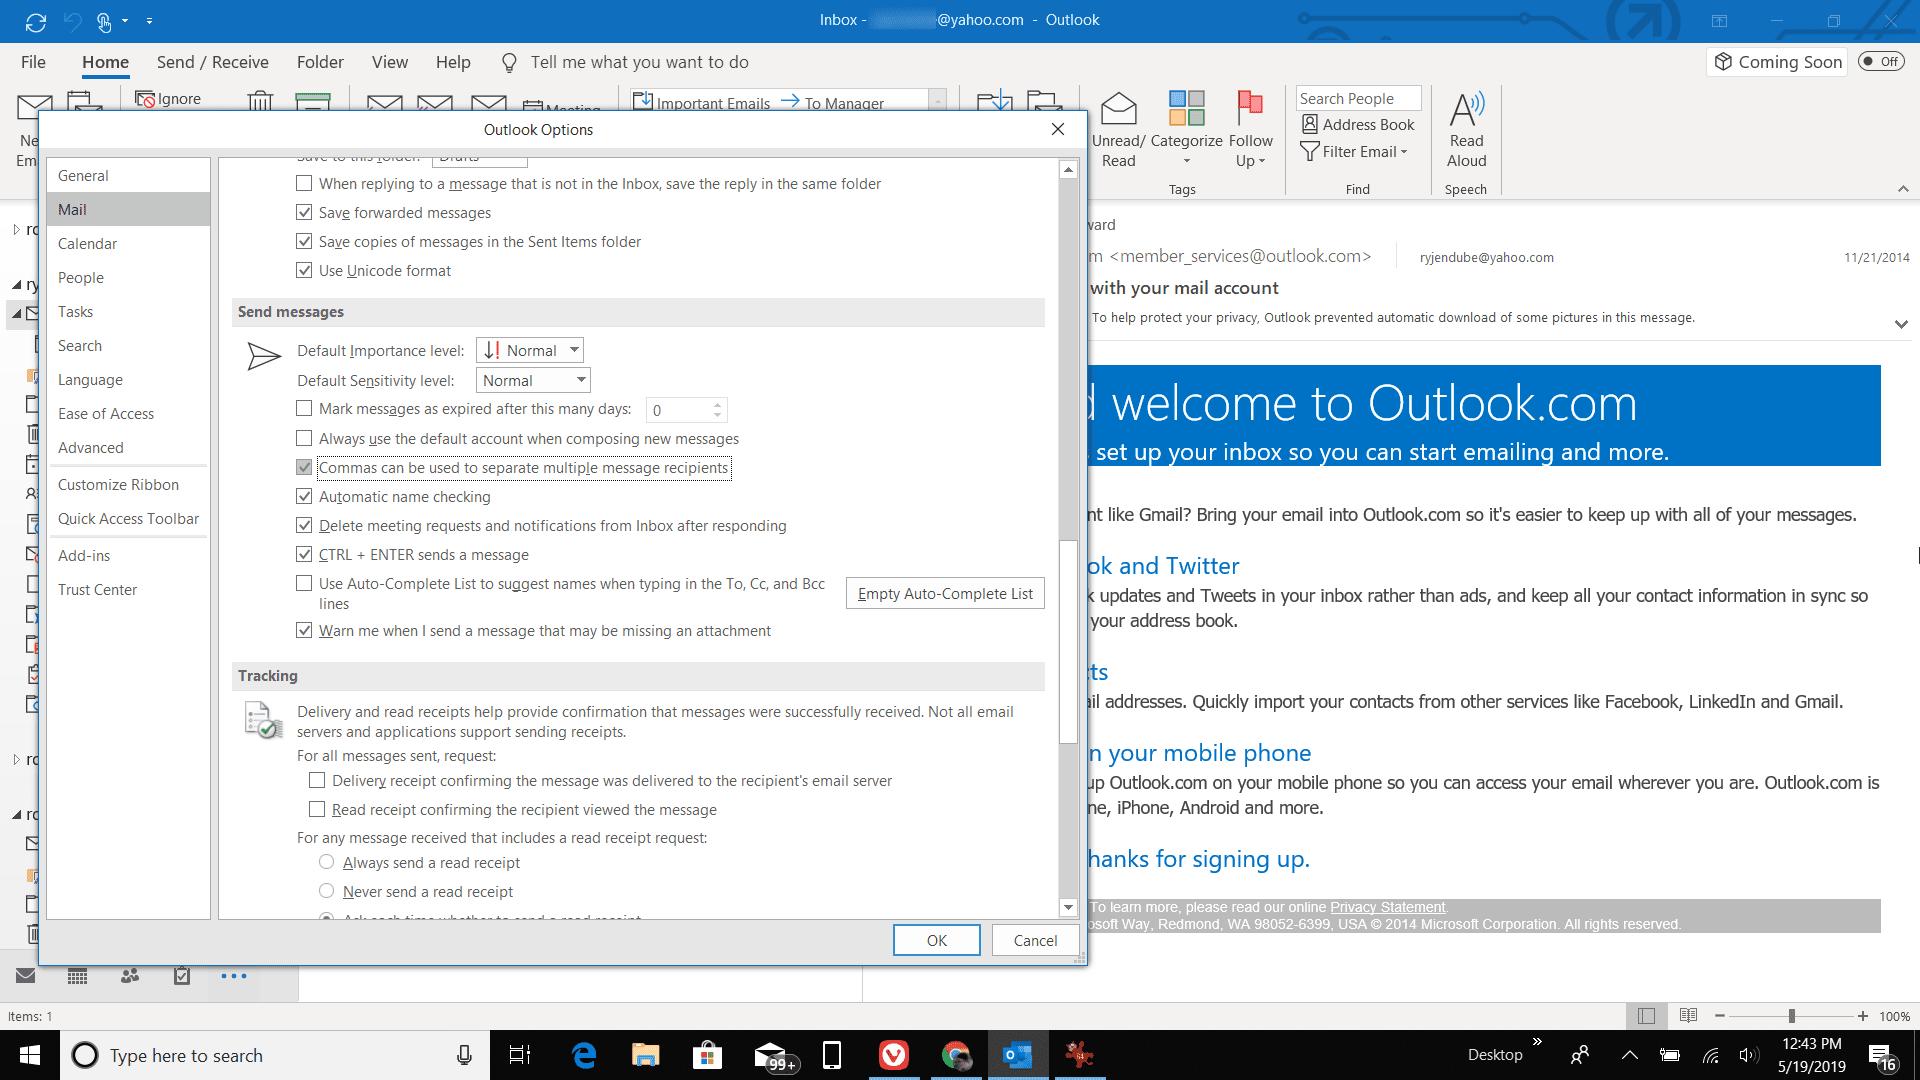 Screenshot of enabling commas for recipients in Outlook